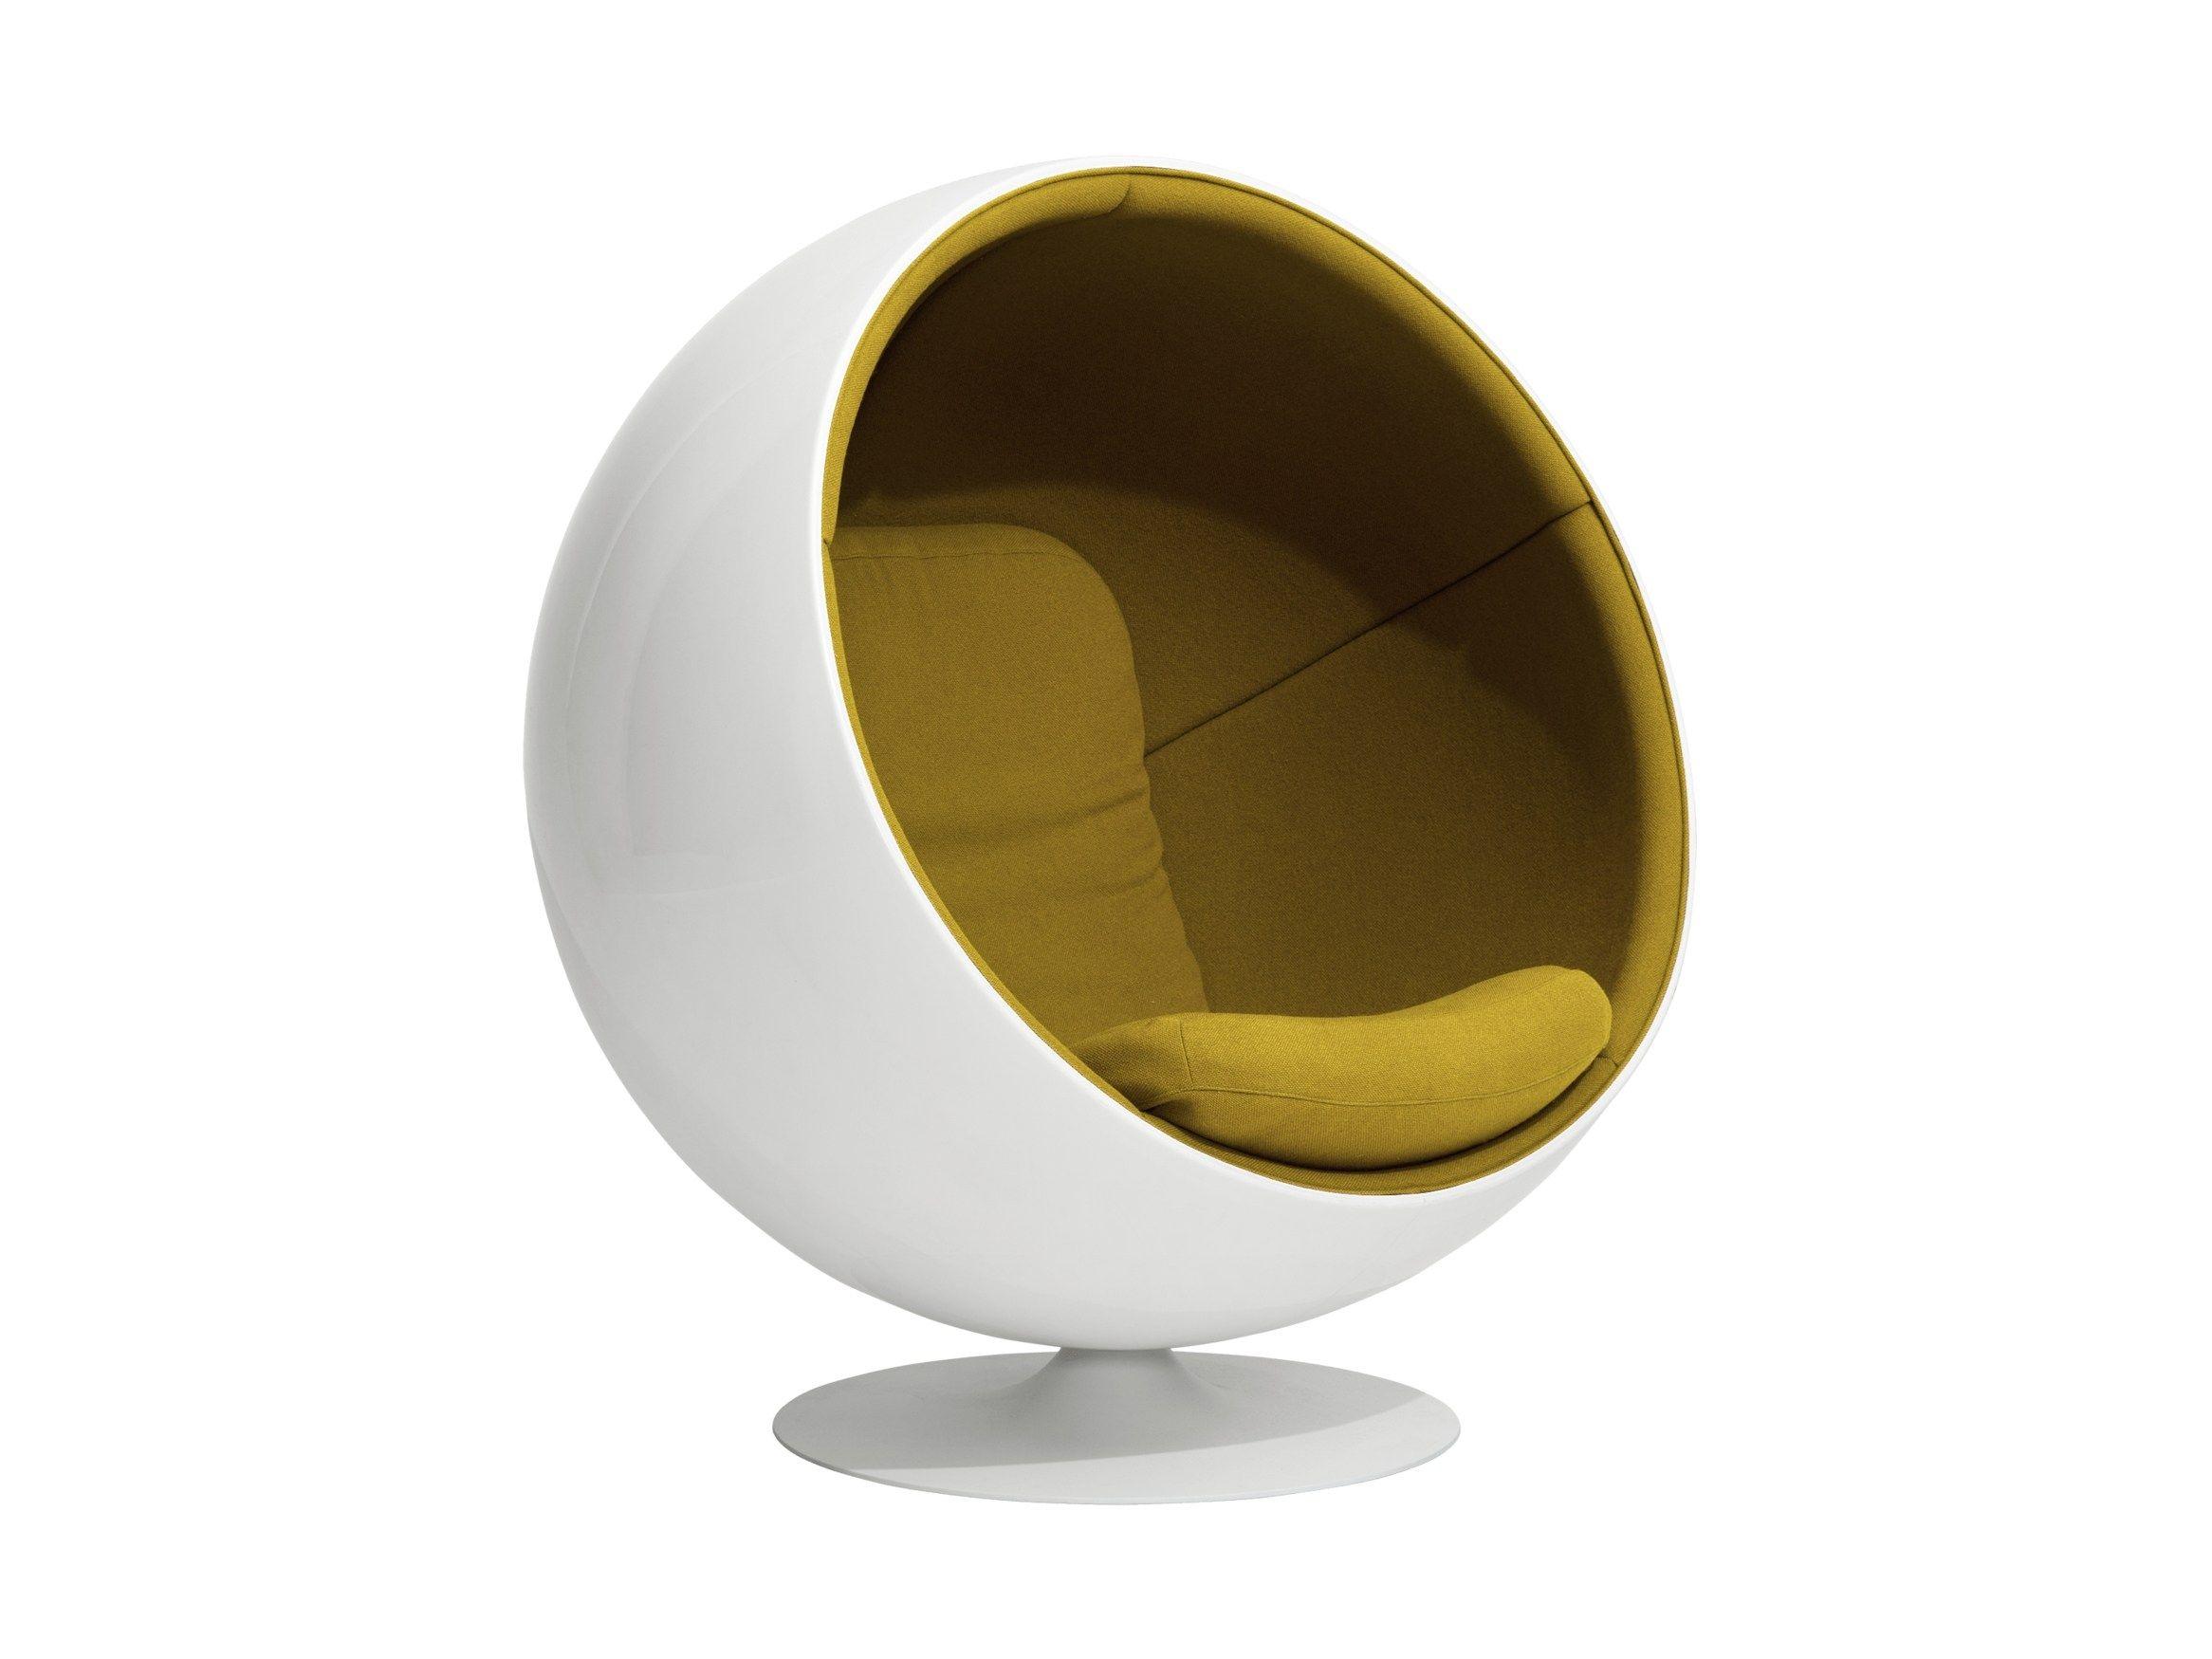 Fibreglass armchair BALL CHAIR By Aarnio Originals design Eero Aarnio